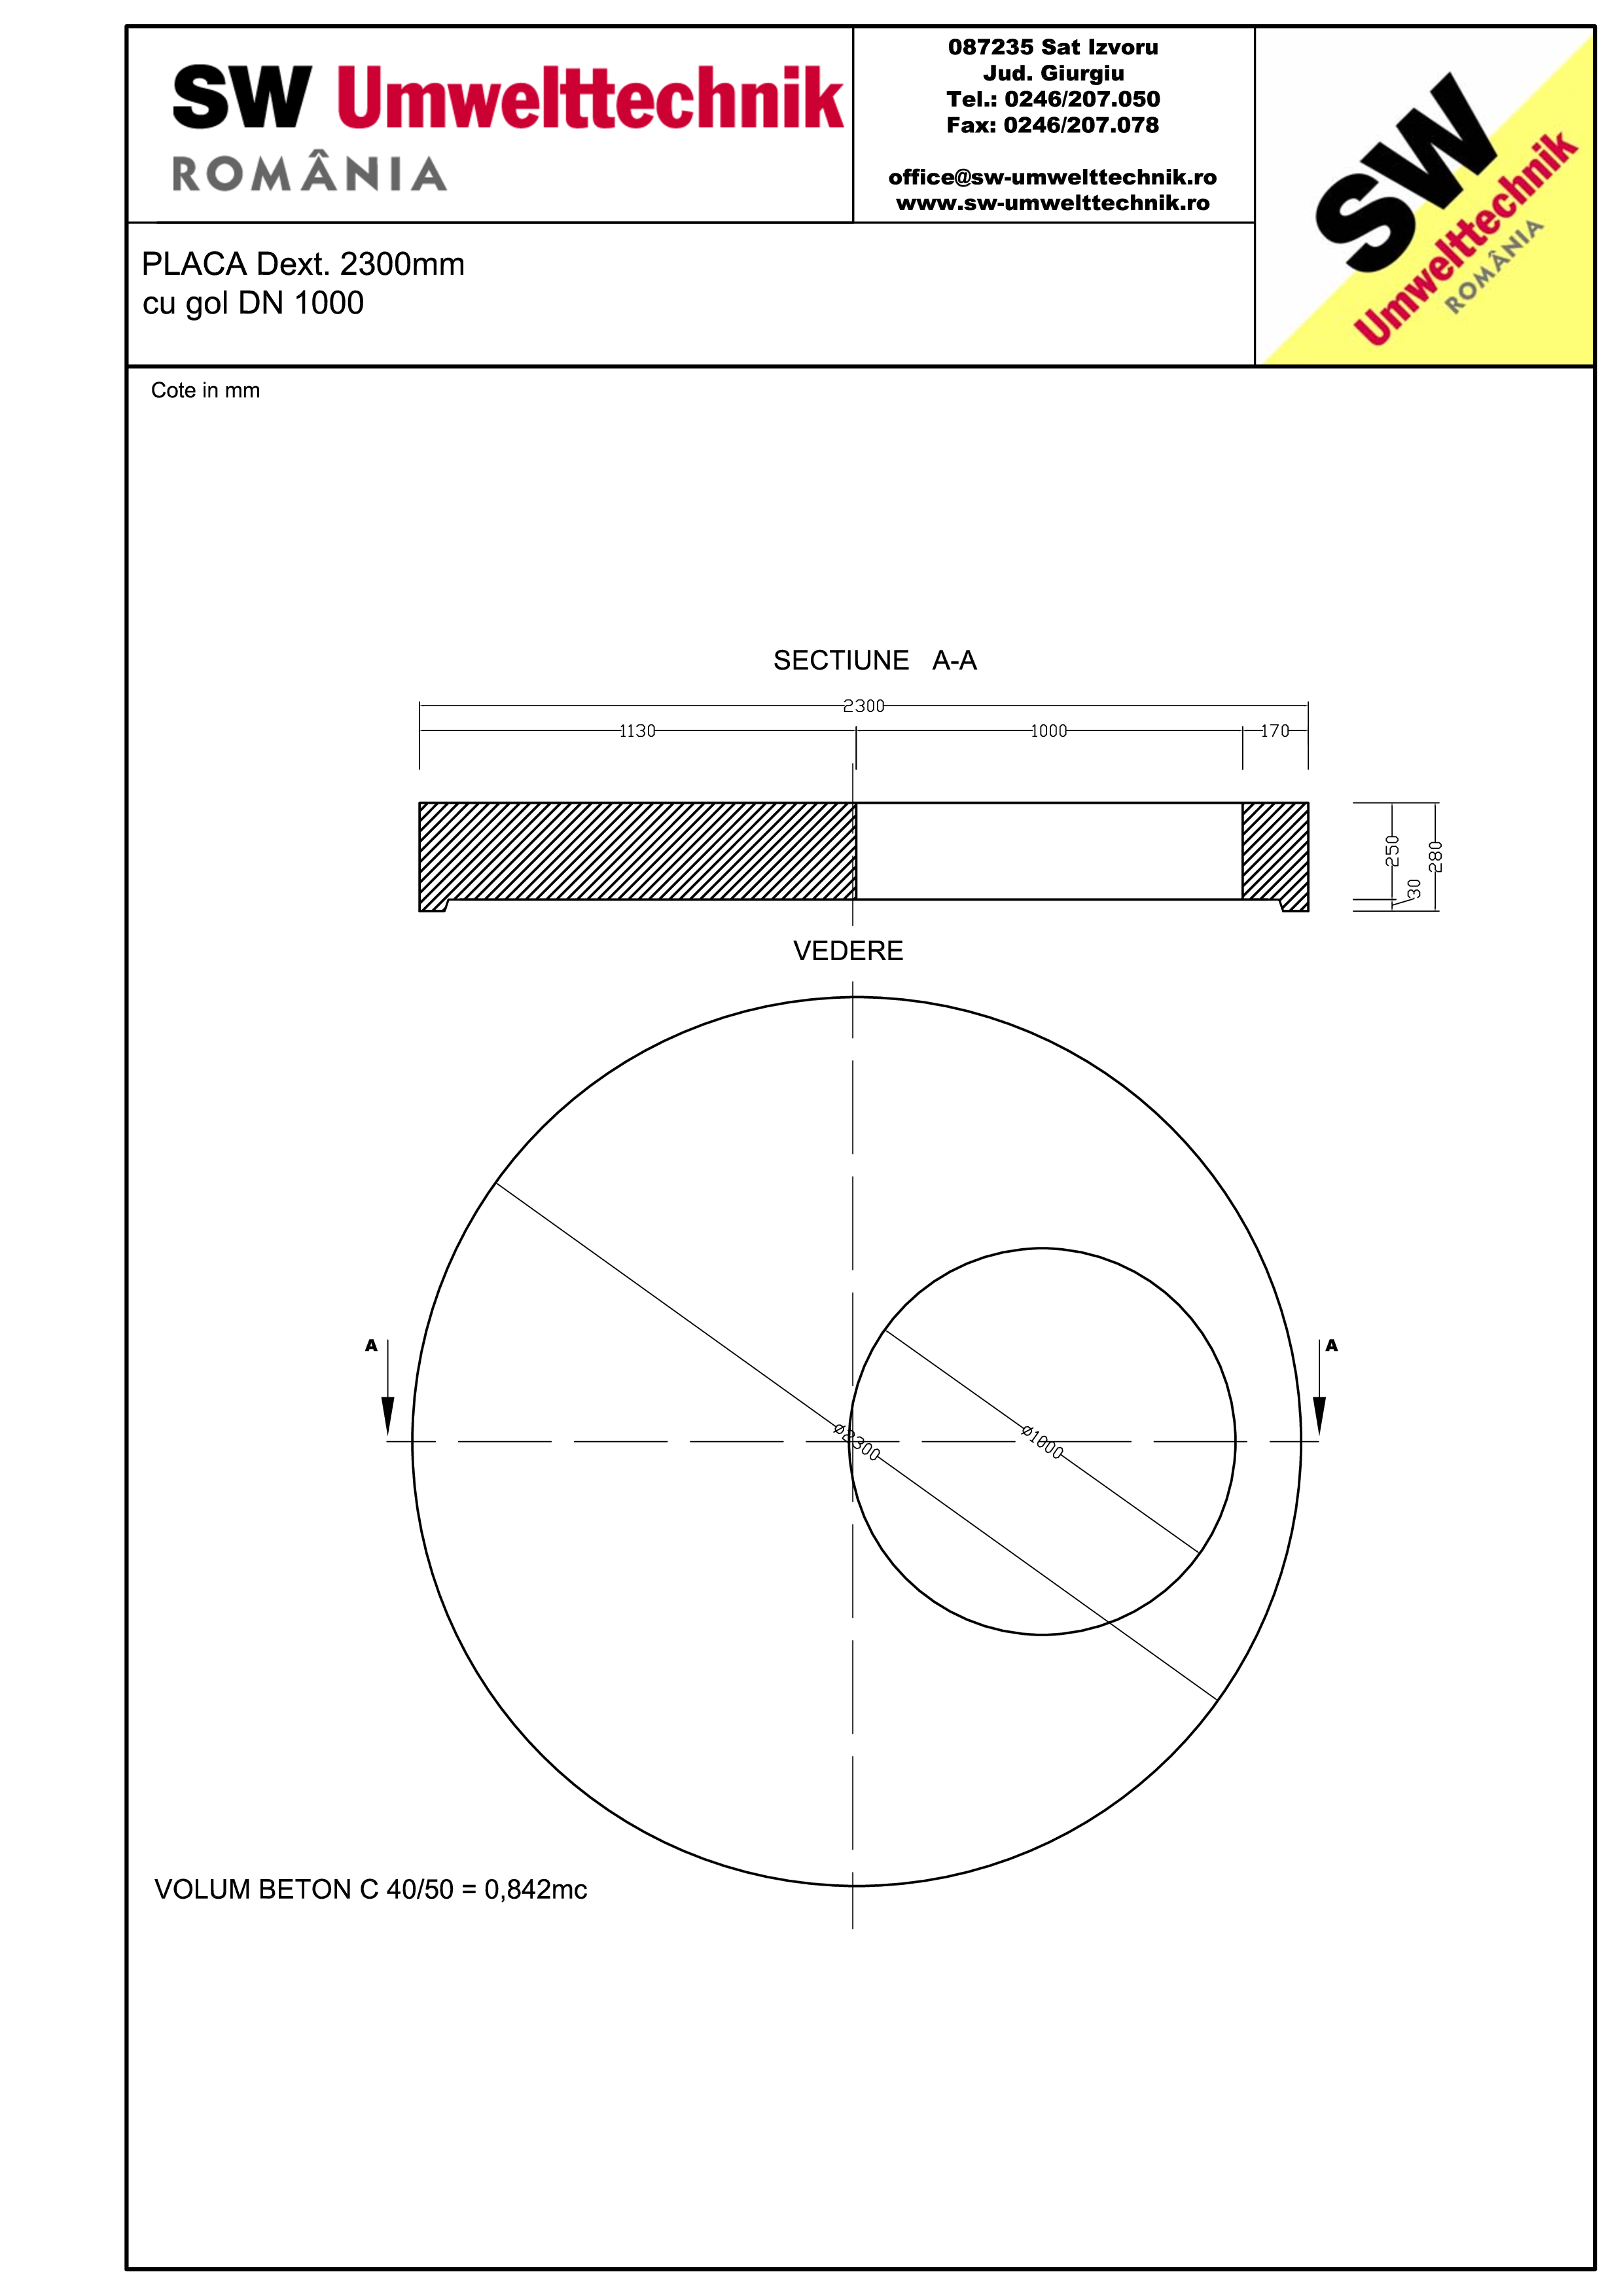 Pagina 1 - CAD-PDF Placa Dext.2300 H250 cu gol DN1000 SW UMWELTTECHNIK Detaliu de produs